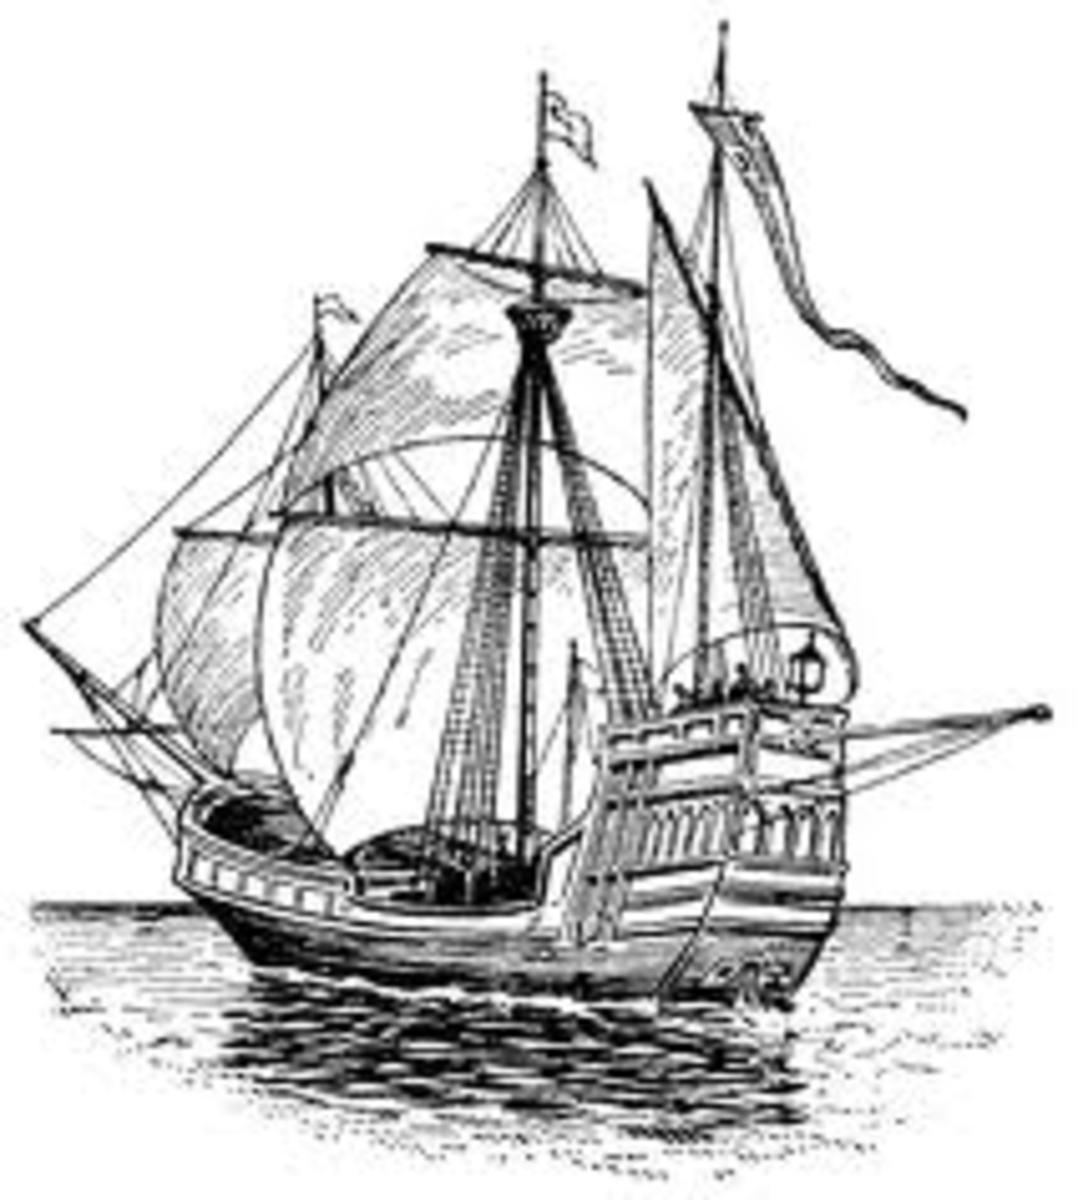 Columbus' ship - Santa Maria